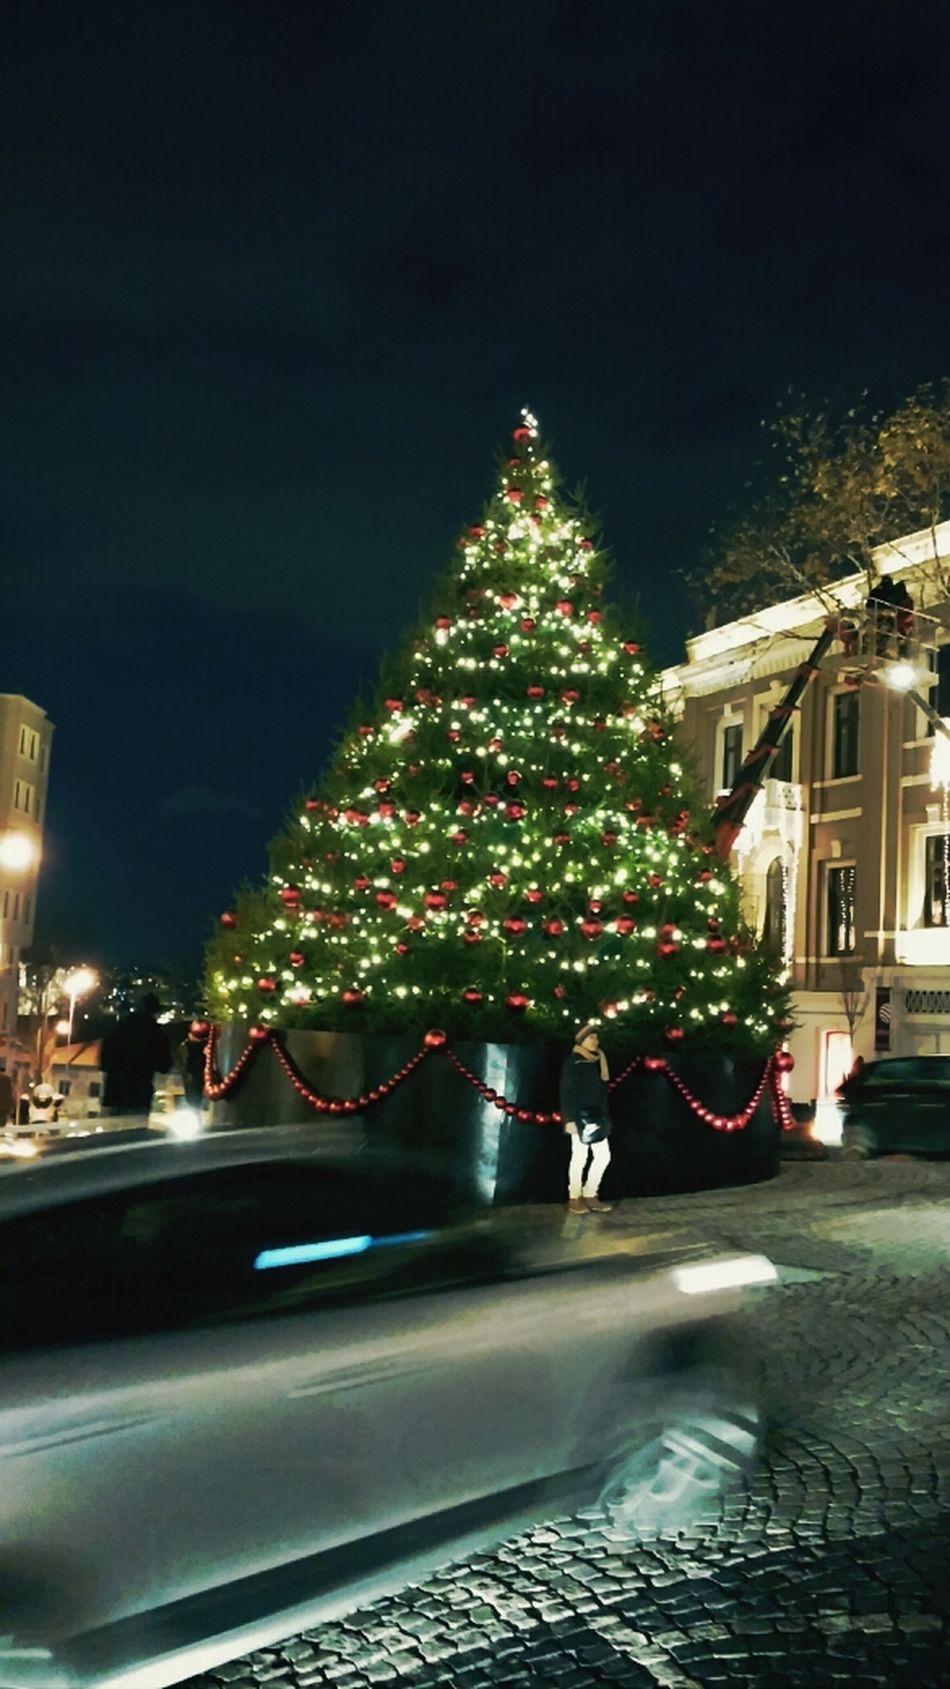 Noël Yılbaşı Ağacı Yılbaşı:) 2014